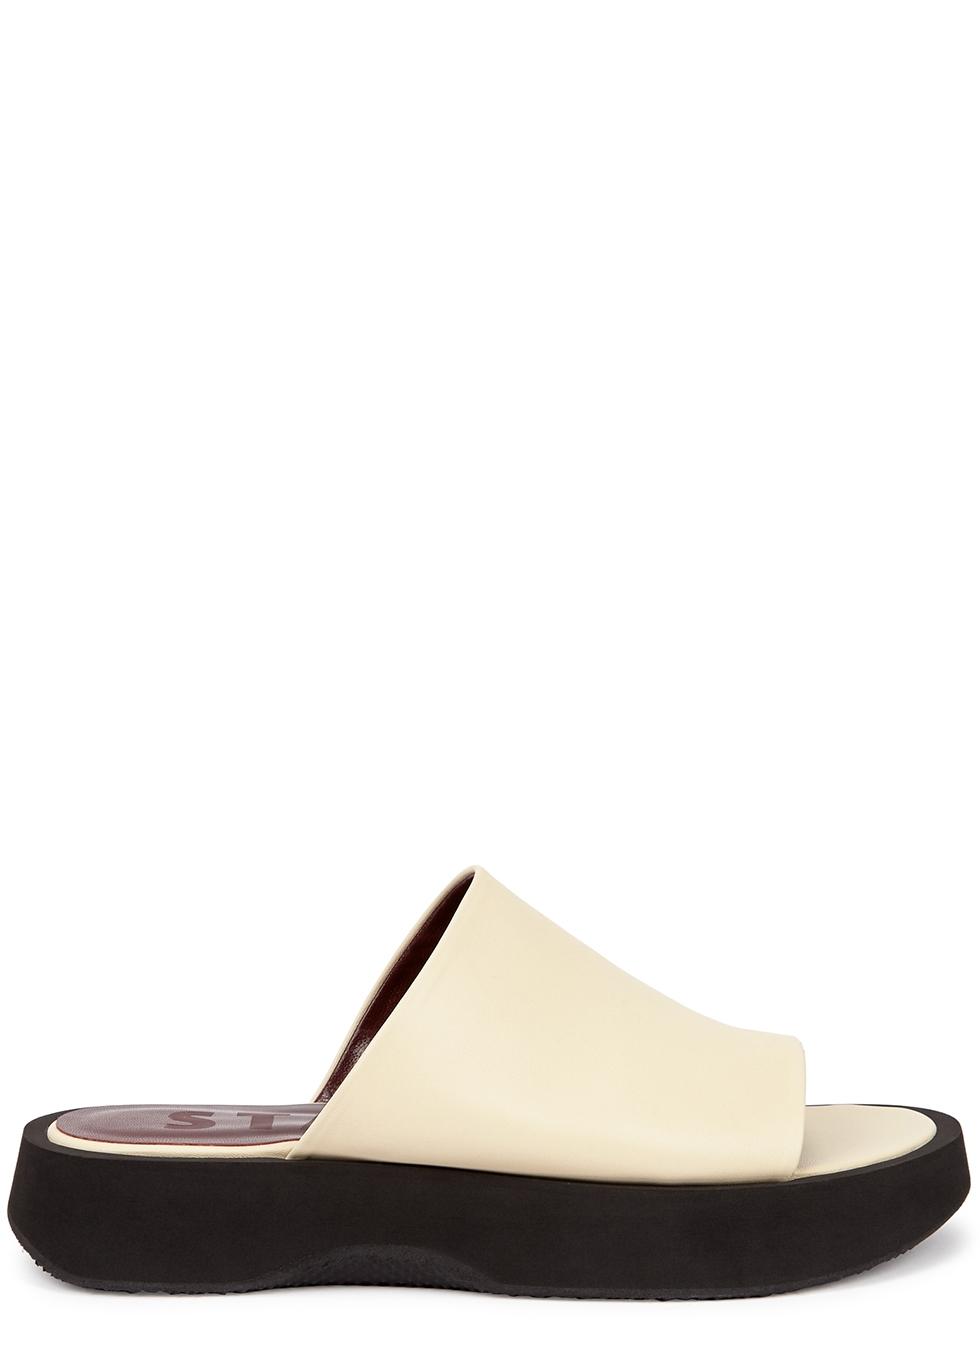 Alpine cream leather flatform sliders